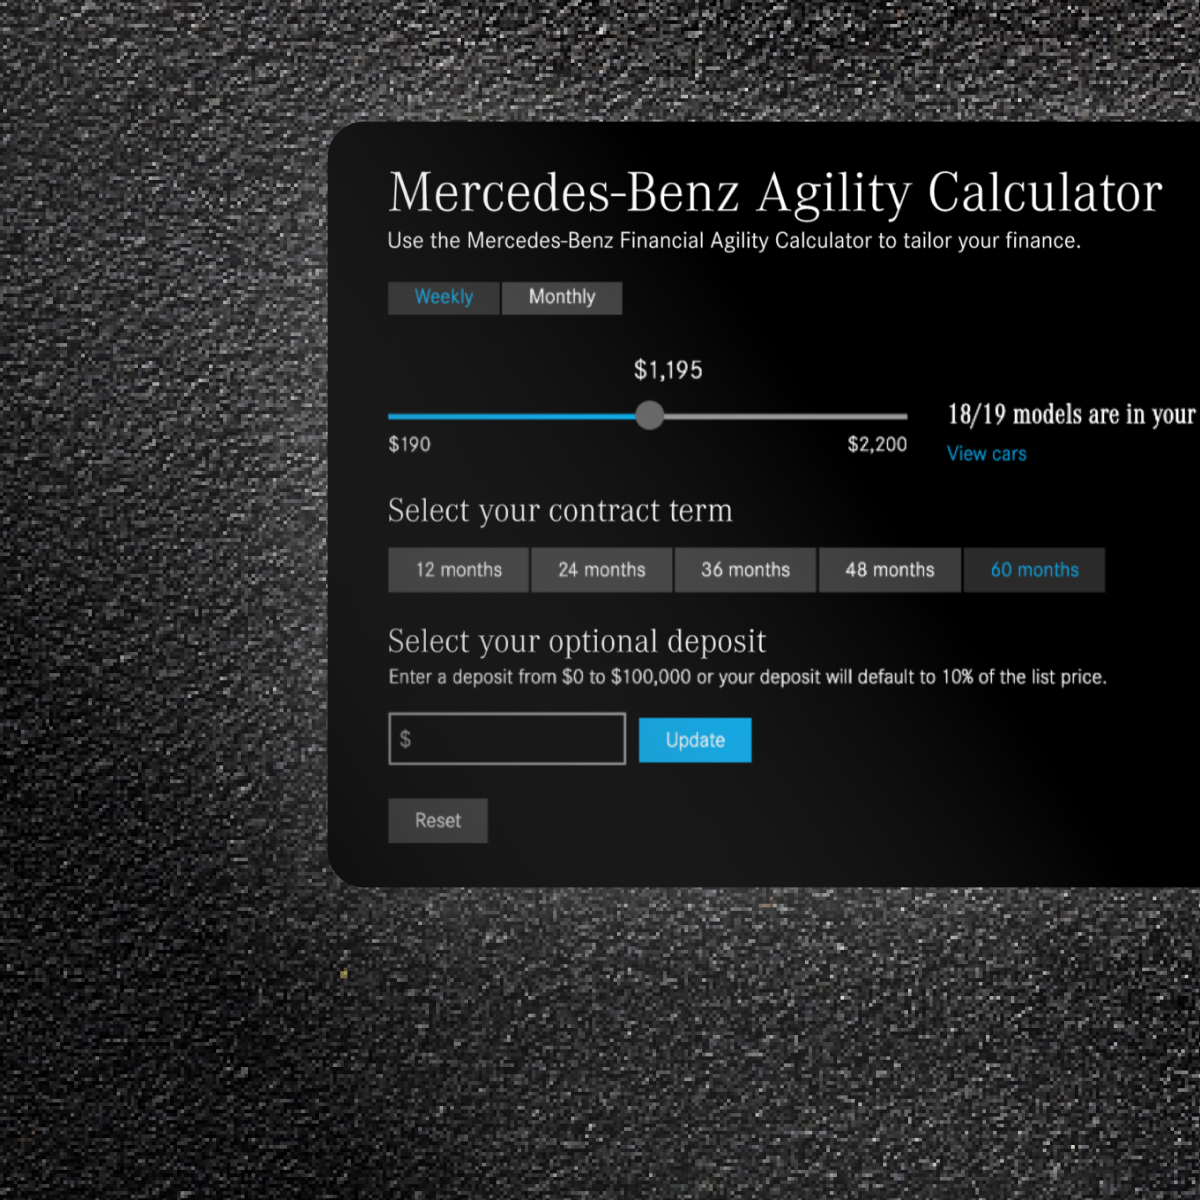 Mercedes-Benz: Affordability Calculator